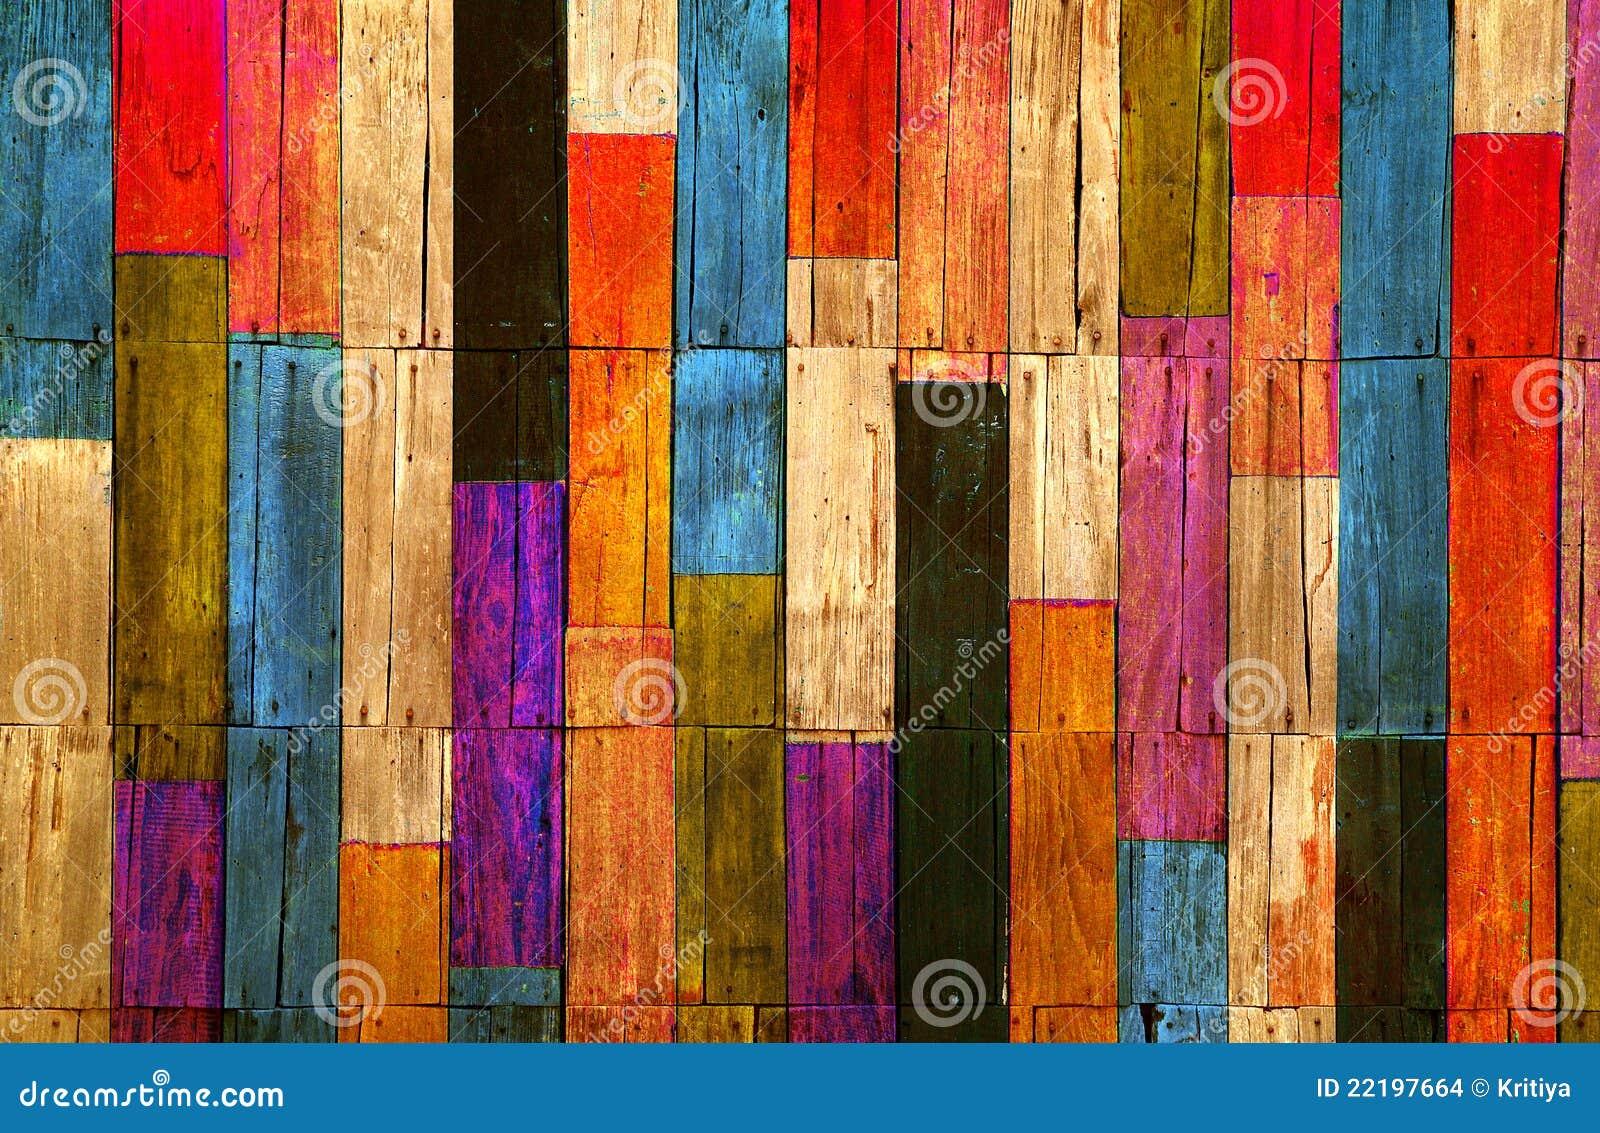 fond en bois de mur de couleur illustration stock illustration du ch ne grunge 22197664. Black Bedroom Furniture Sets. Home Design Ideas